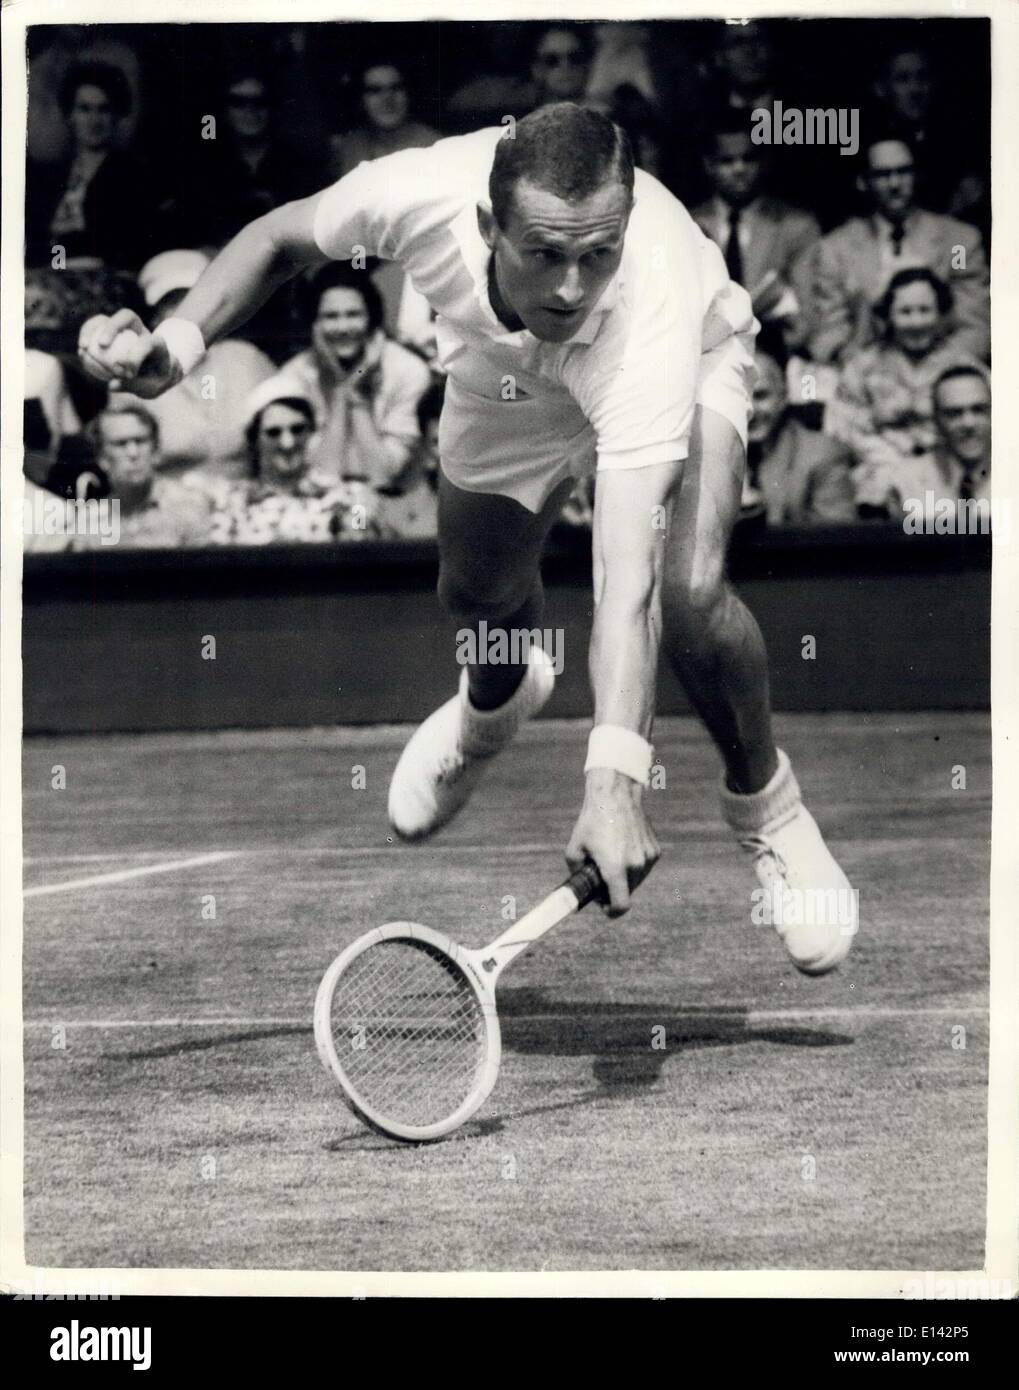 Apr. 04, 2012 - Tennis At Wimbledon - Men's Semi-Finals. K.Nielsen V. N. Fraser. Photo shows Neale Fraser Australia , in play a - Stock Image